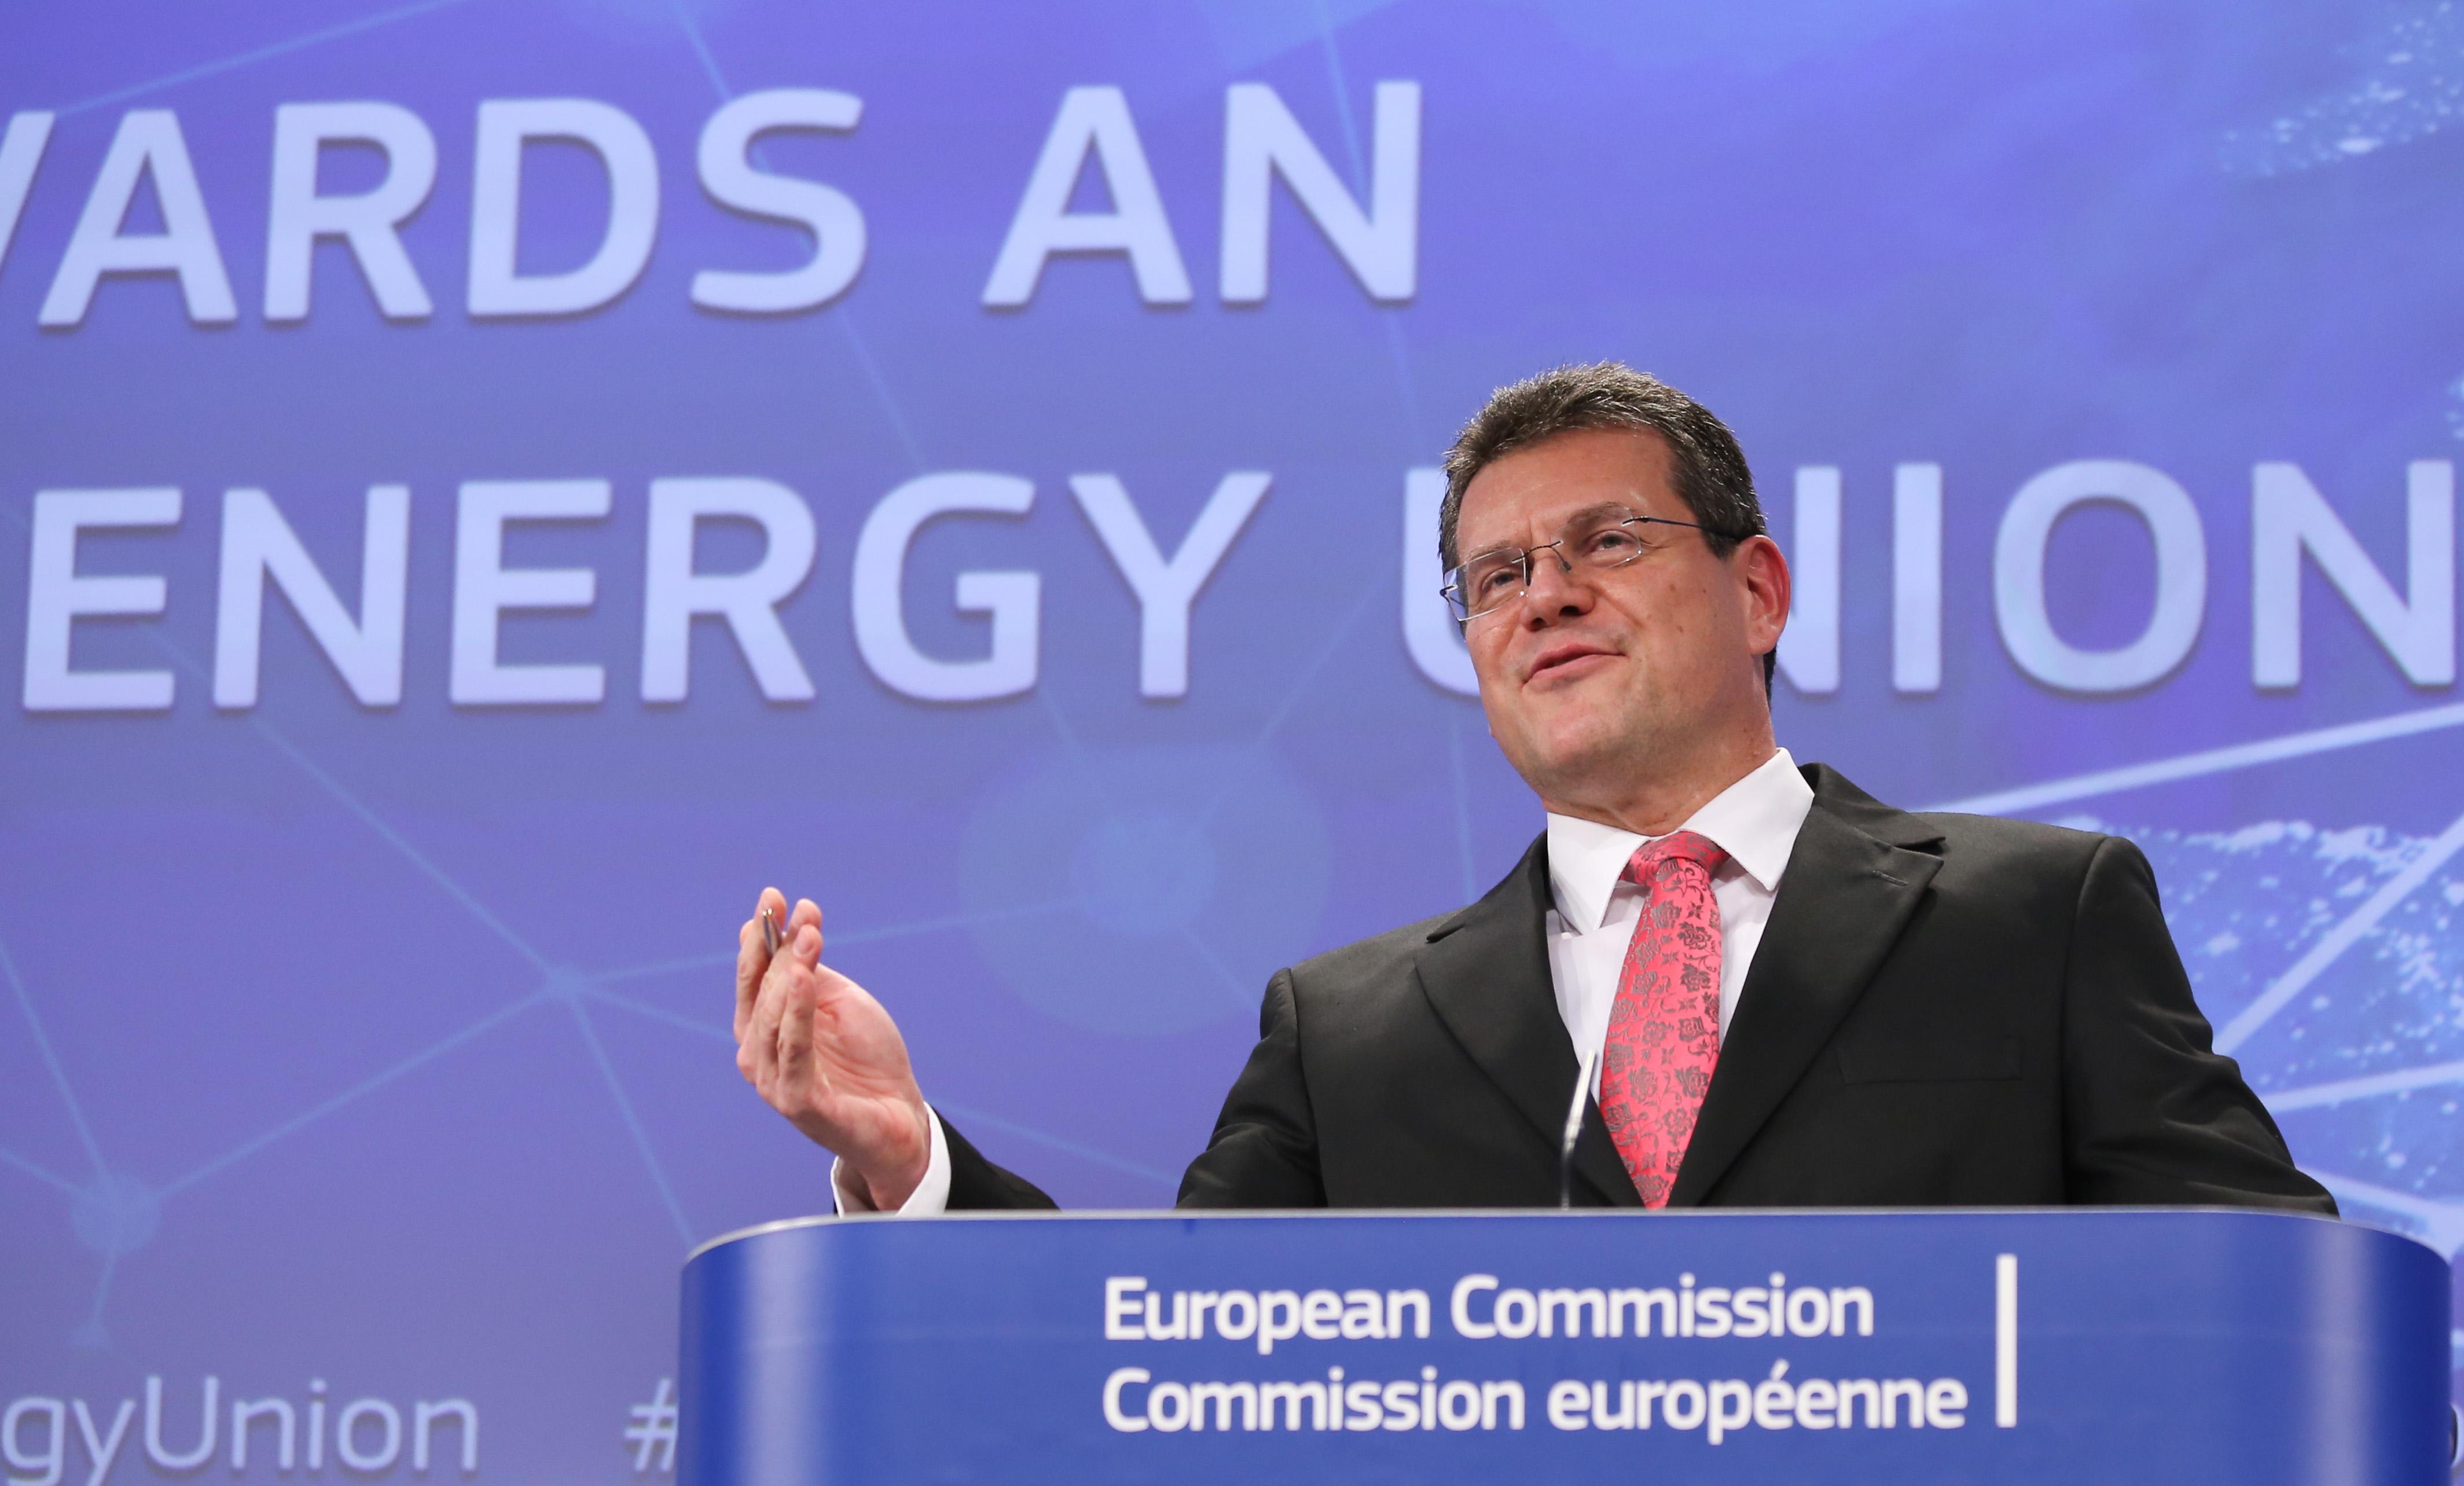 EU Europa Nachrichten Energie Sefcovic